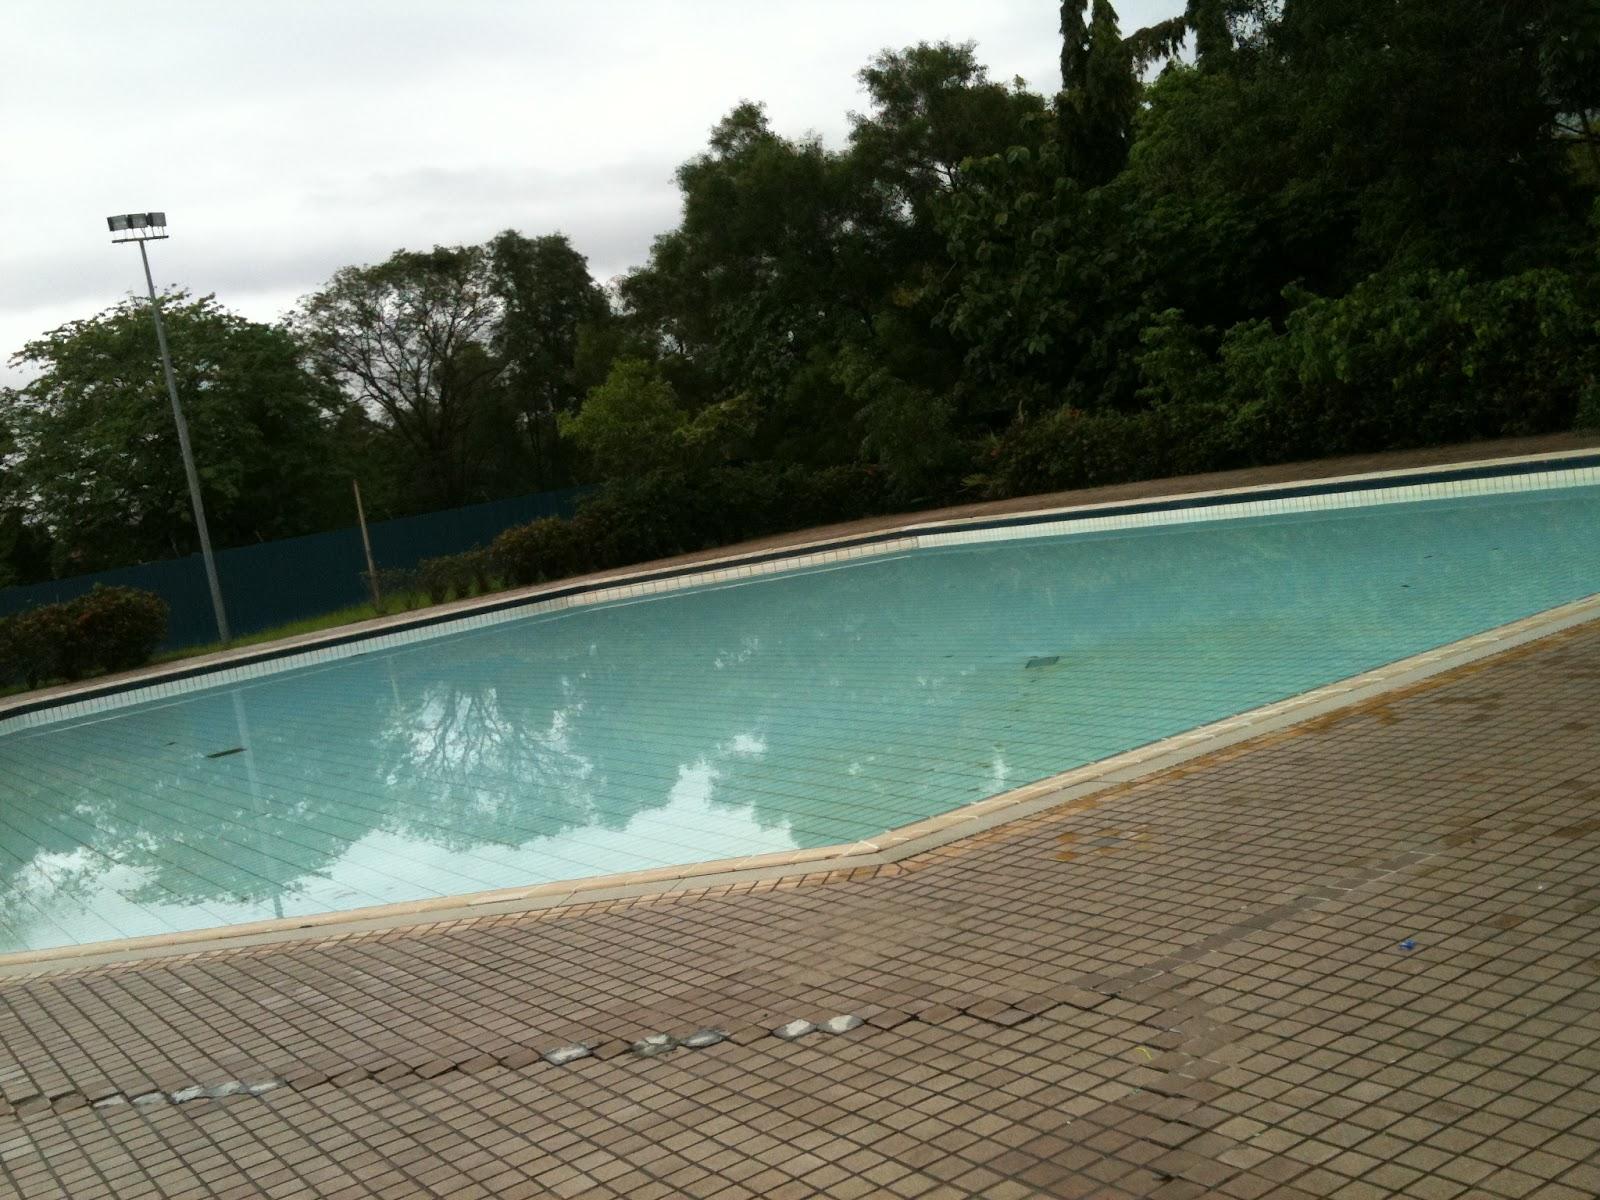 Marinestars swimming team mst penang malaysia 2012 - Seberang jaya public swimming pool ...